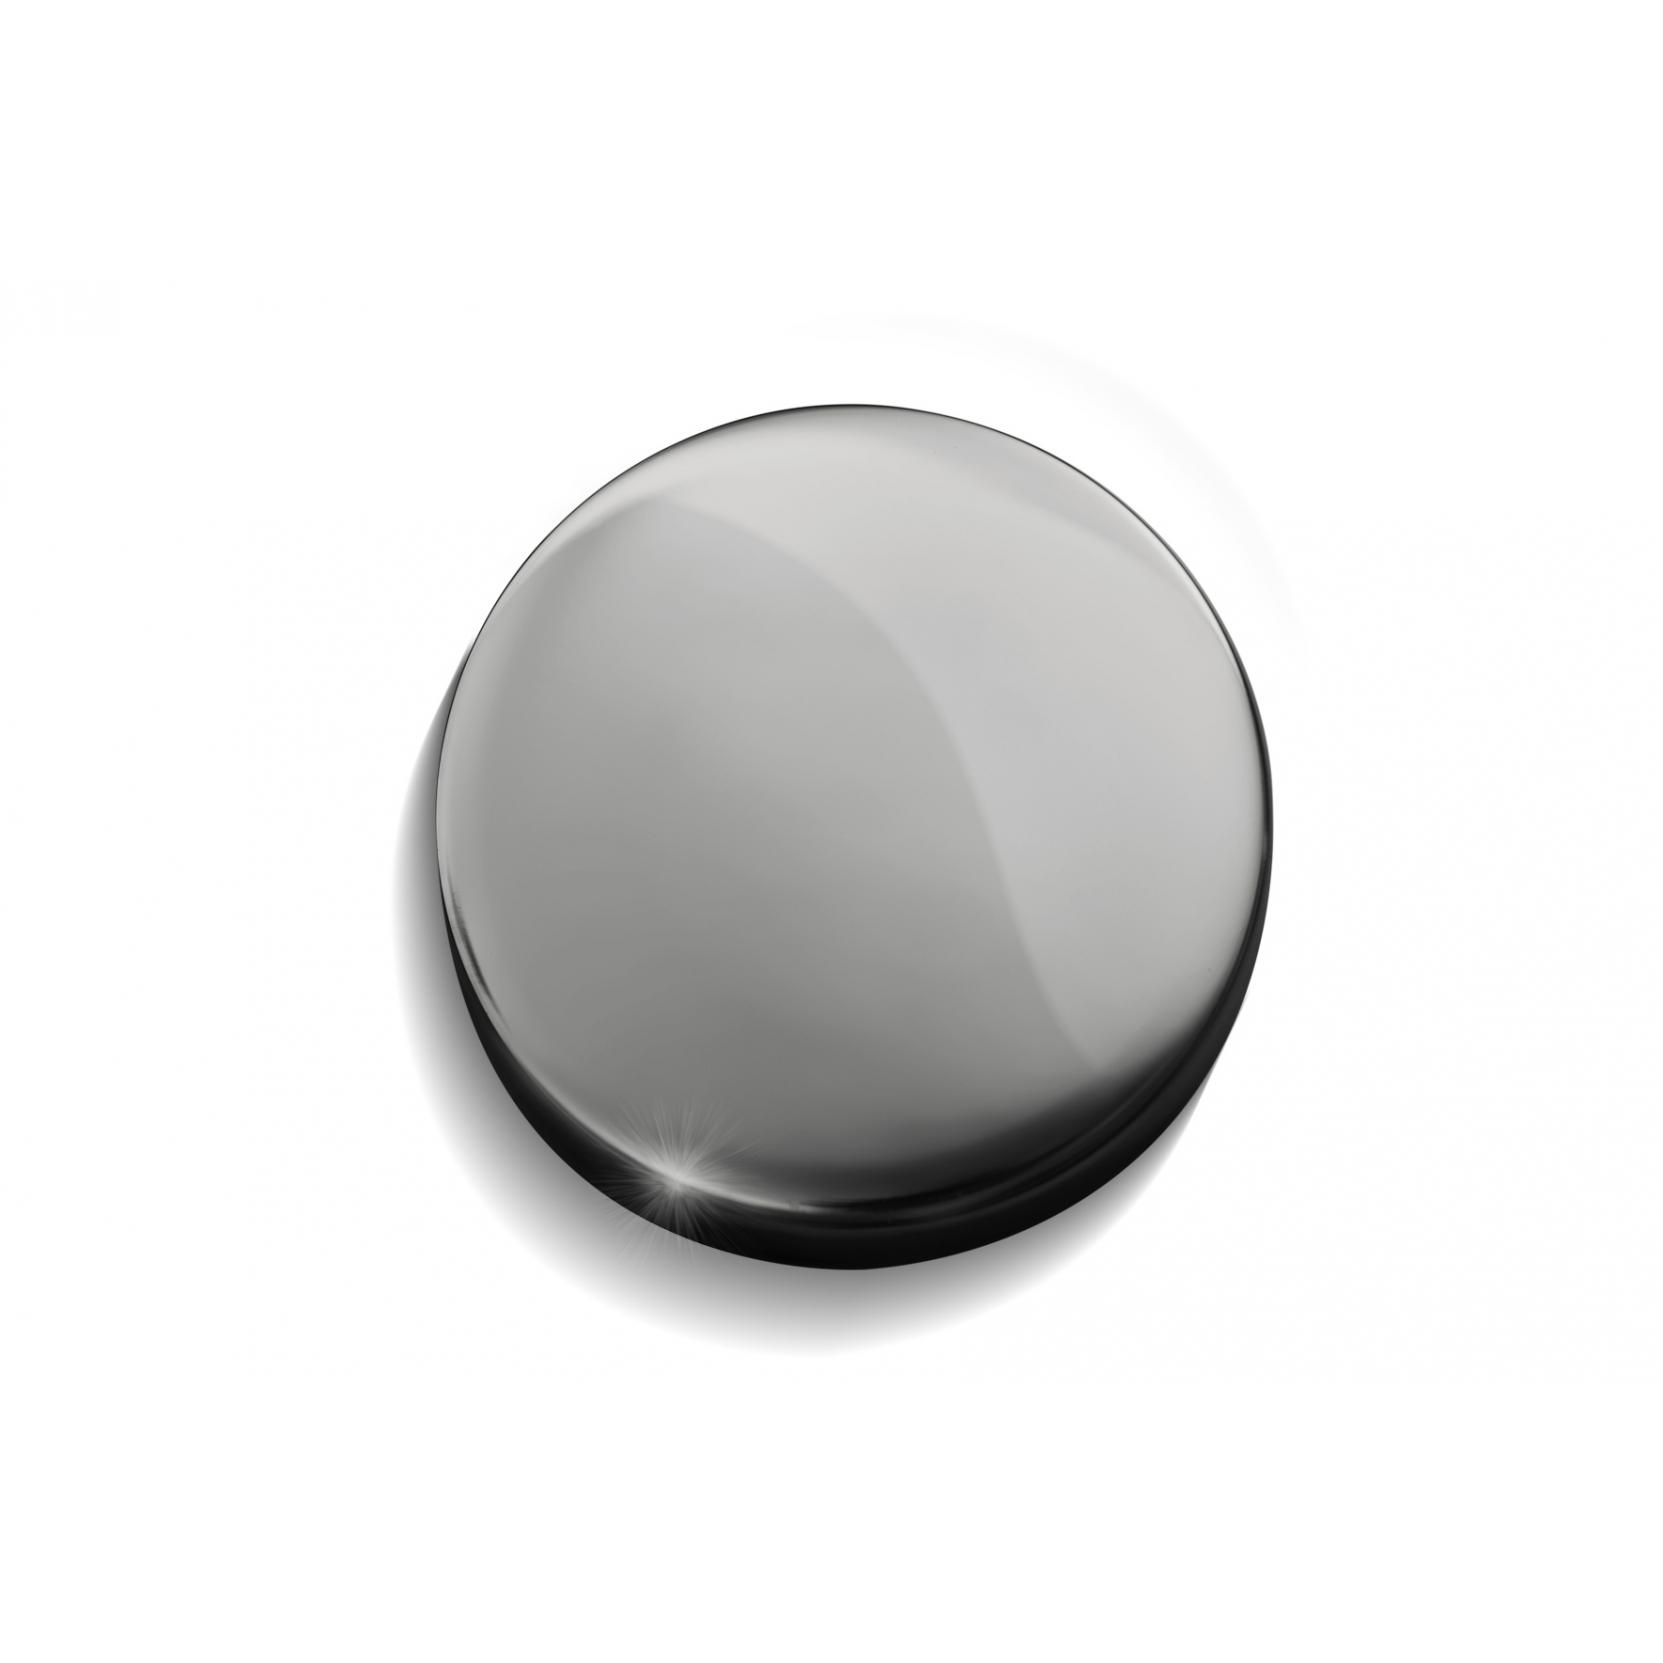 40 X 40 X 40 Square Coffee Table Ac4 Laminate Floor: BELLOSTA REVIVRE HEADSHOWER SQUARE LED WHITE 20X20